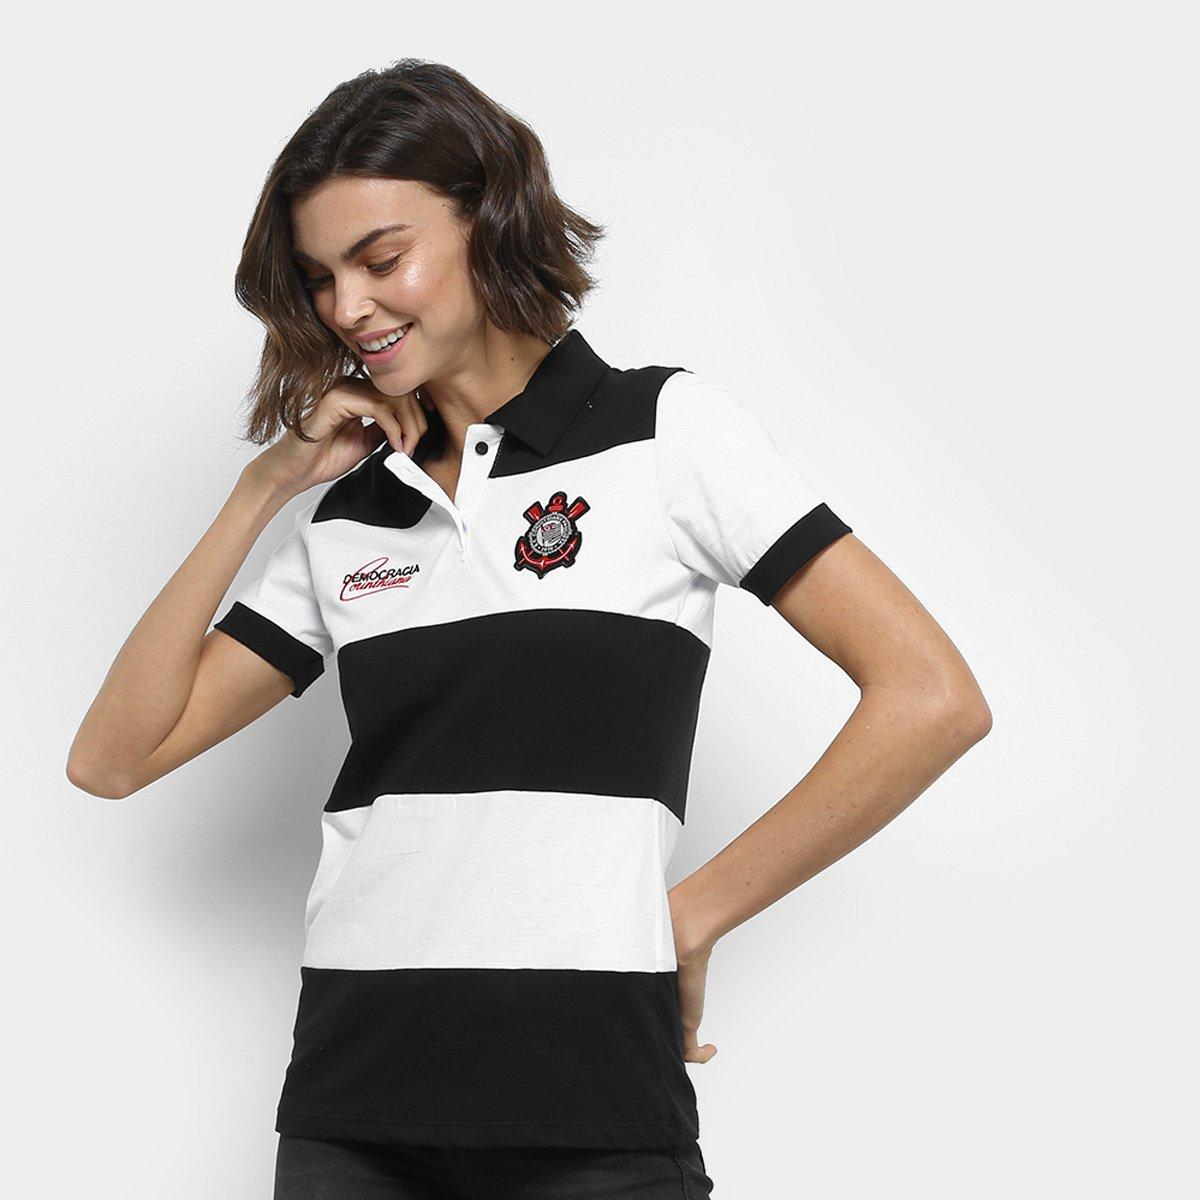 Camisa Polo Corinthians Democracia 1982 Feminina - Preto e Branco ... 7987bf492644e